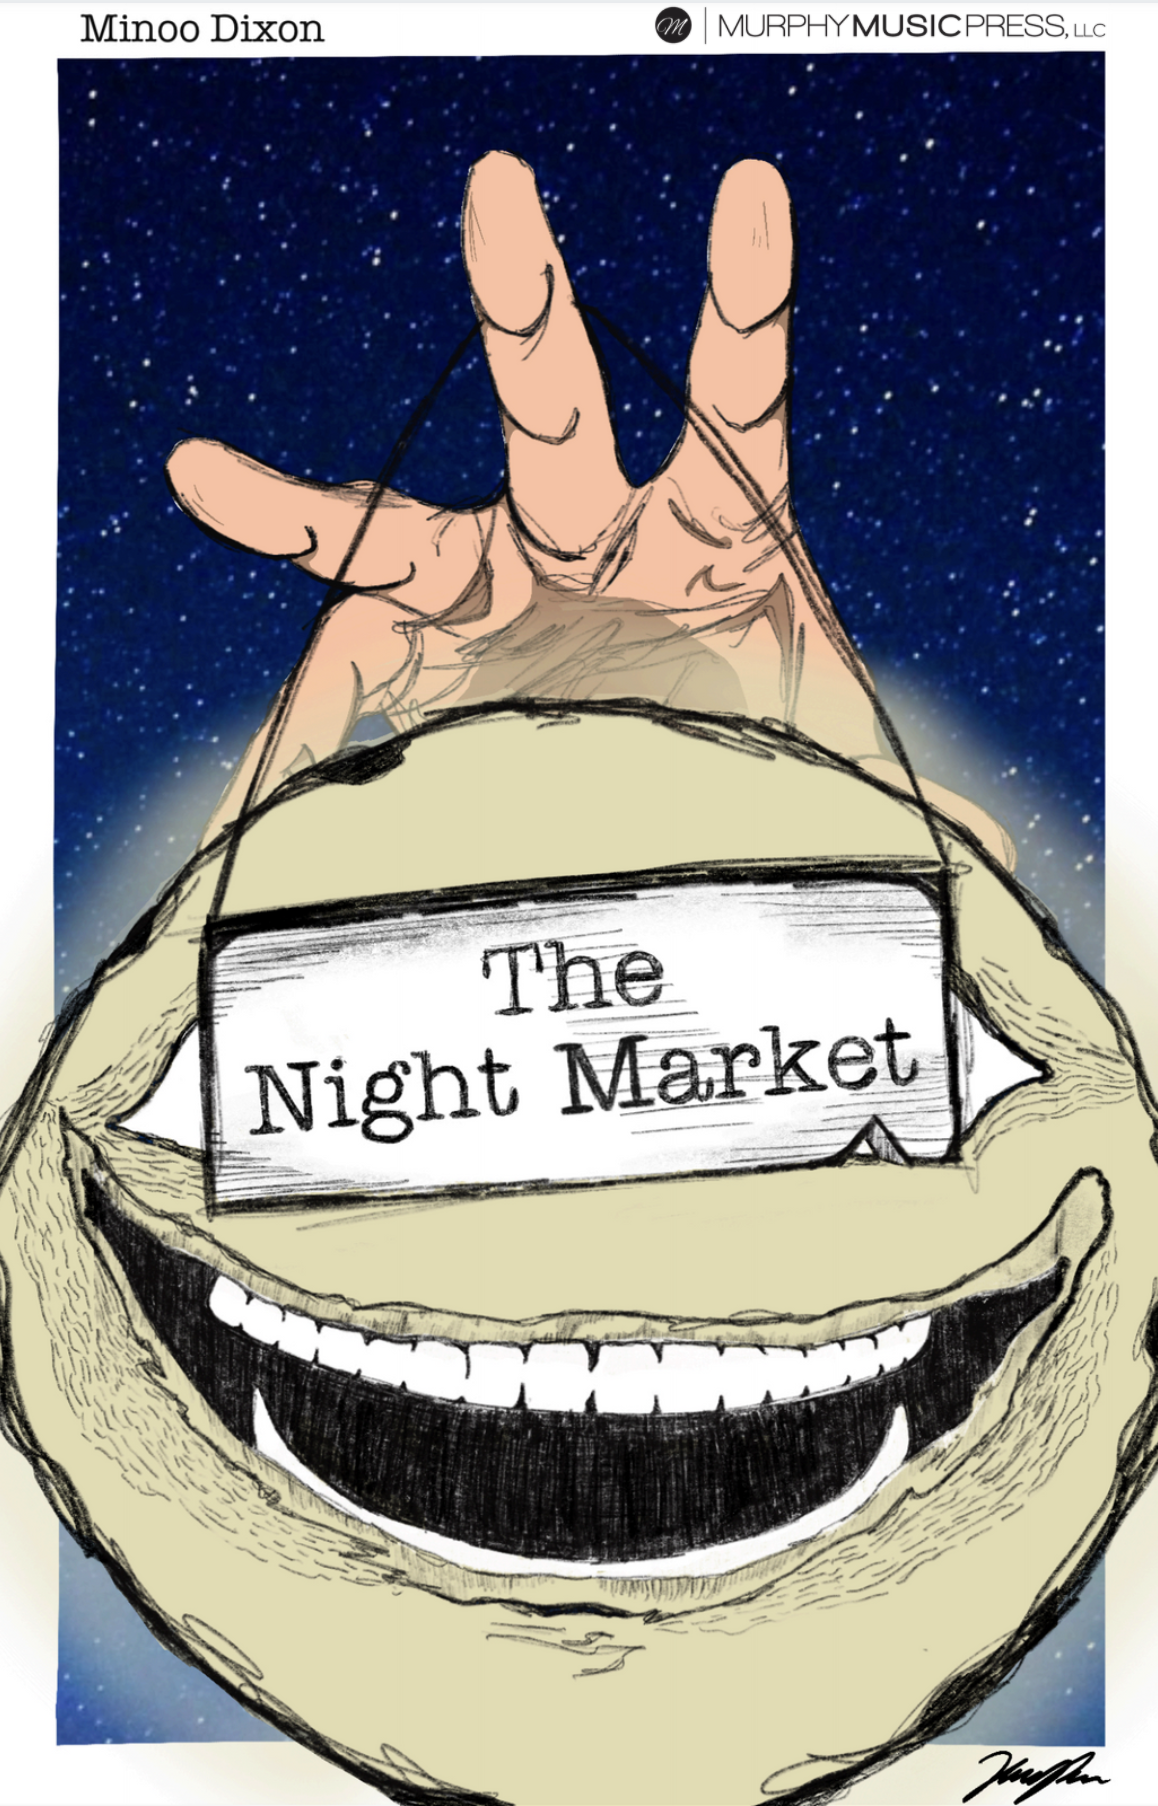 The Night Market by Minoo Dixon